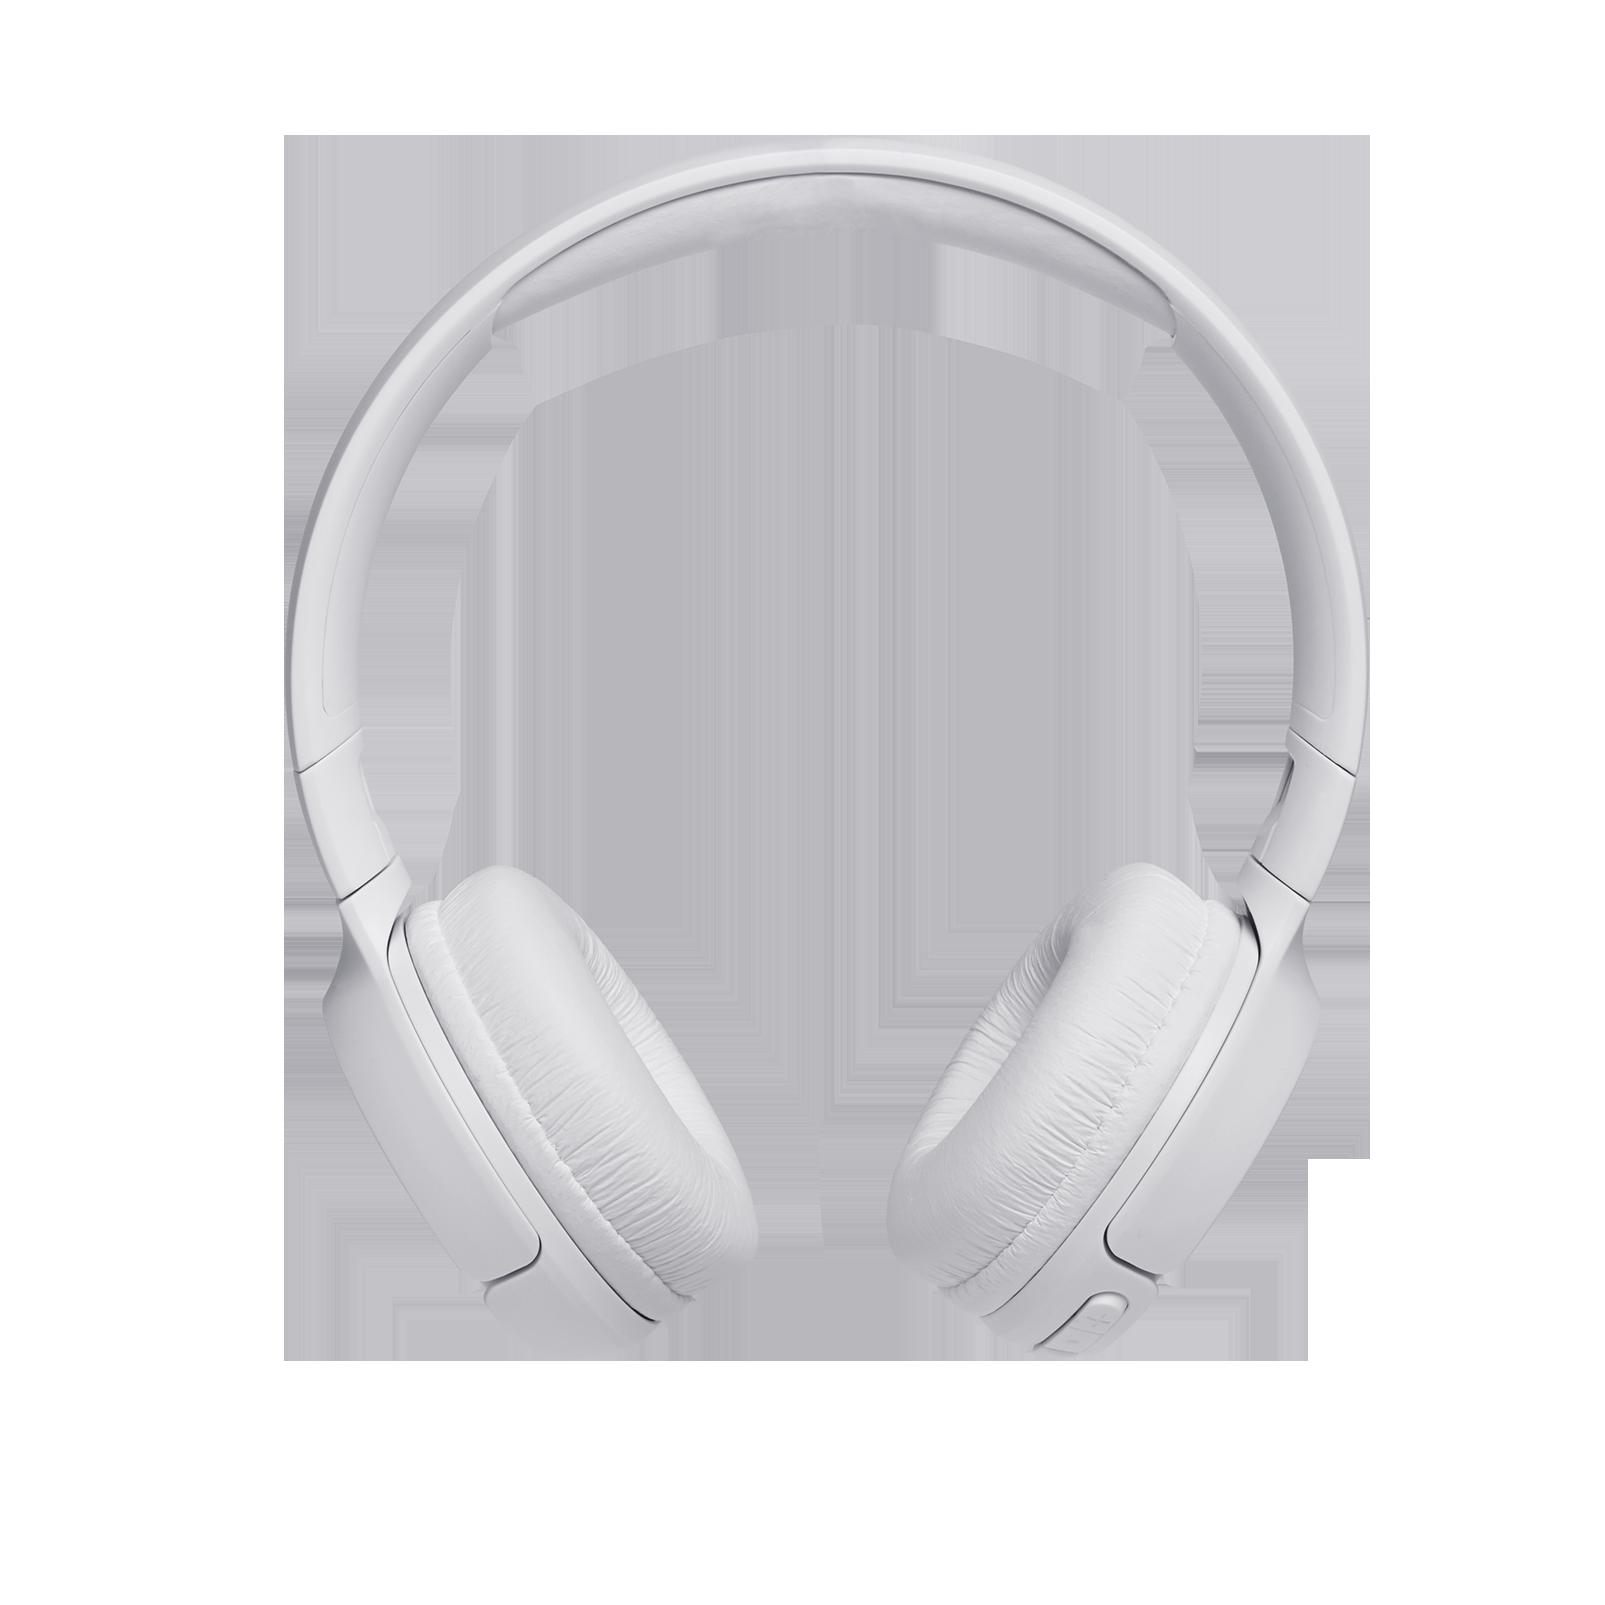 JBL TUNE 560BT - White - Wireless on-ear headphones - Left